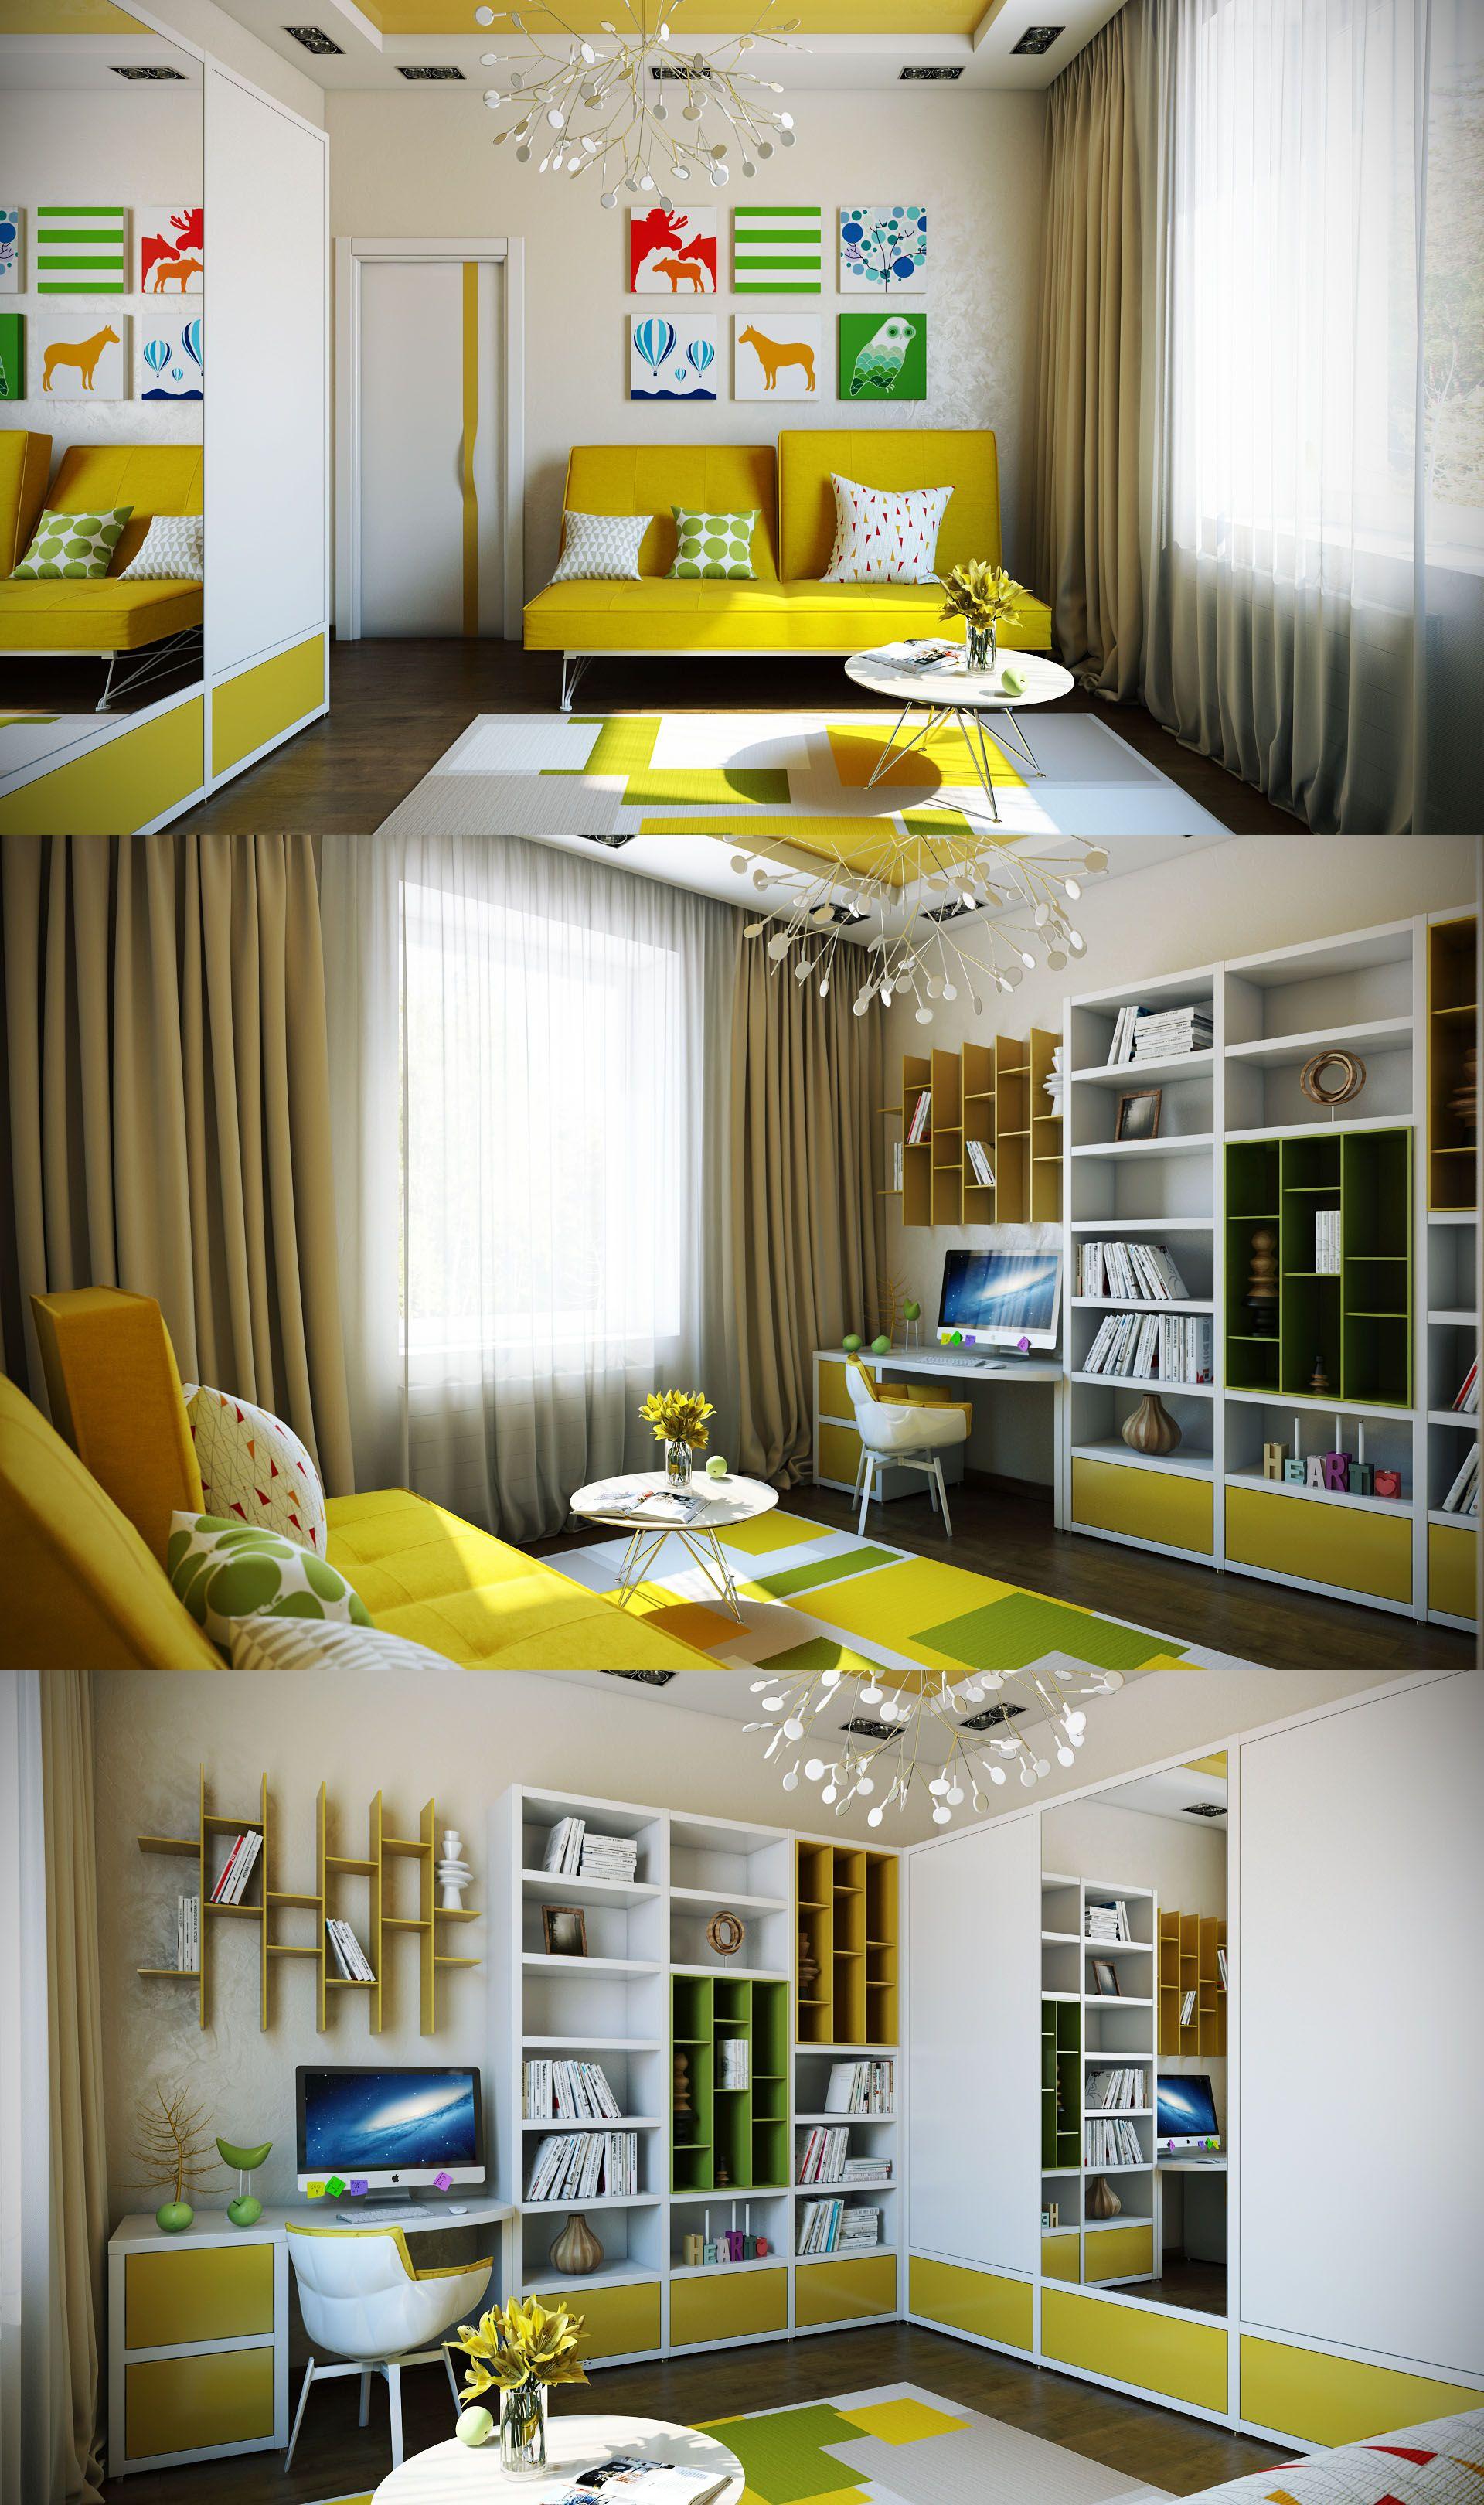 High Quality Casting Color Over Kids Rooms.   Галерея 3ddd.ru